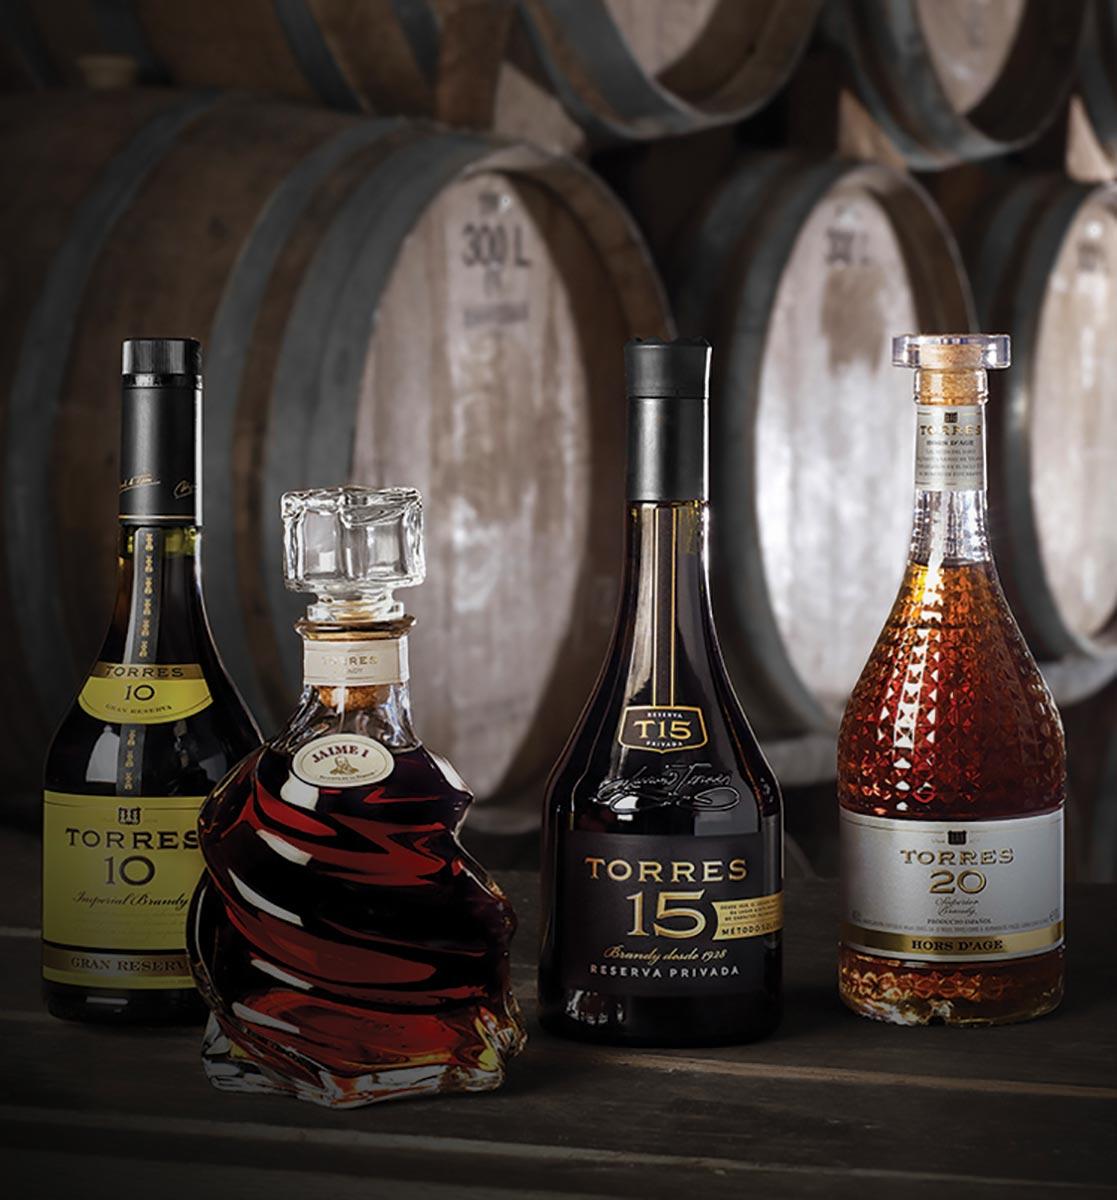 Juan Torres Master Distillers Names Infinium Spirits U.S. Importer